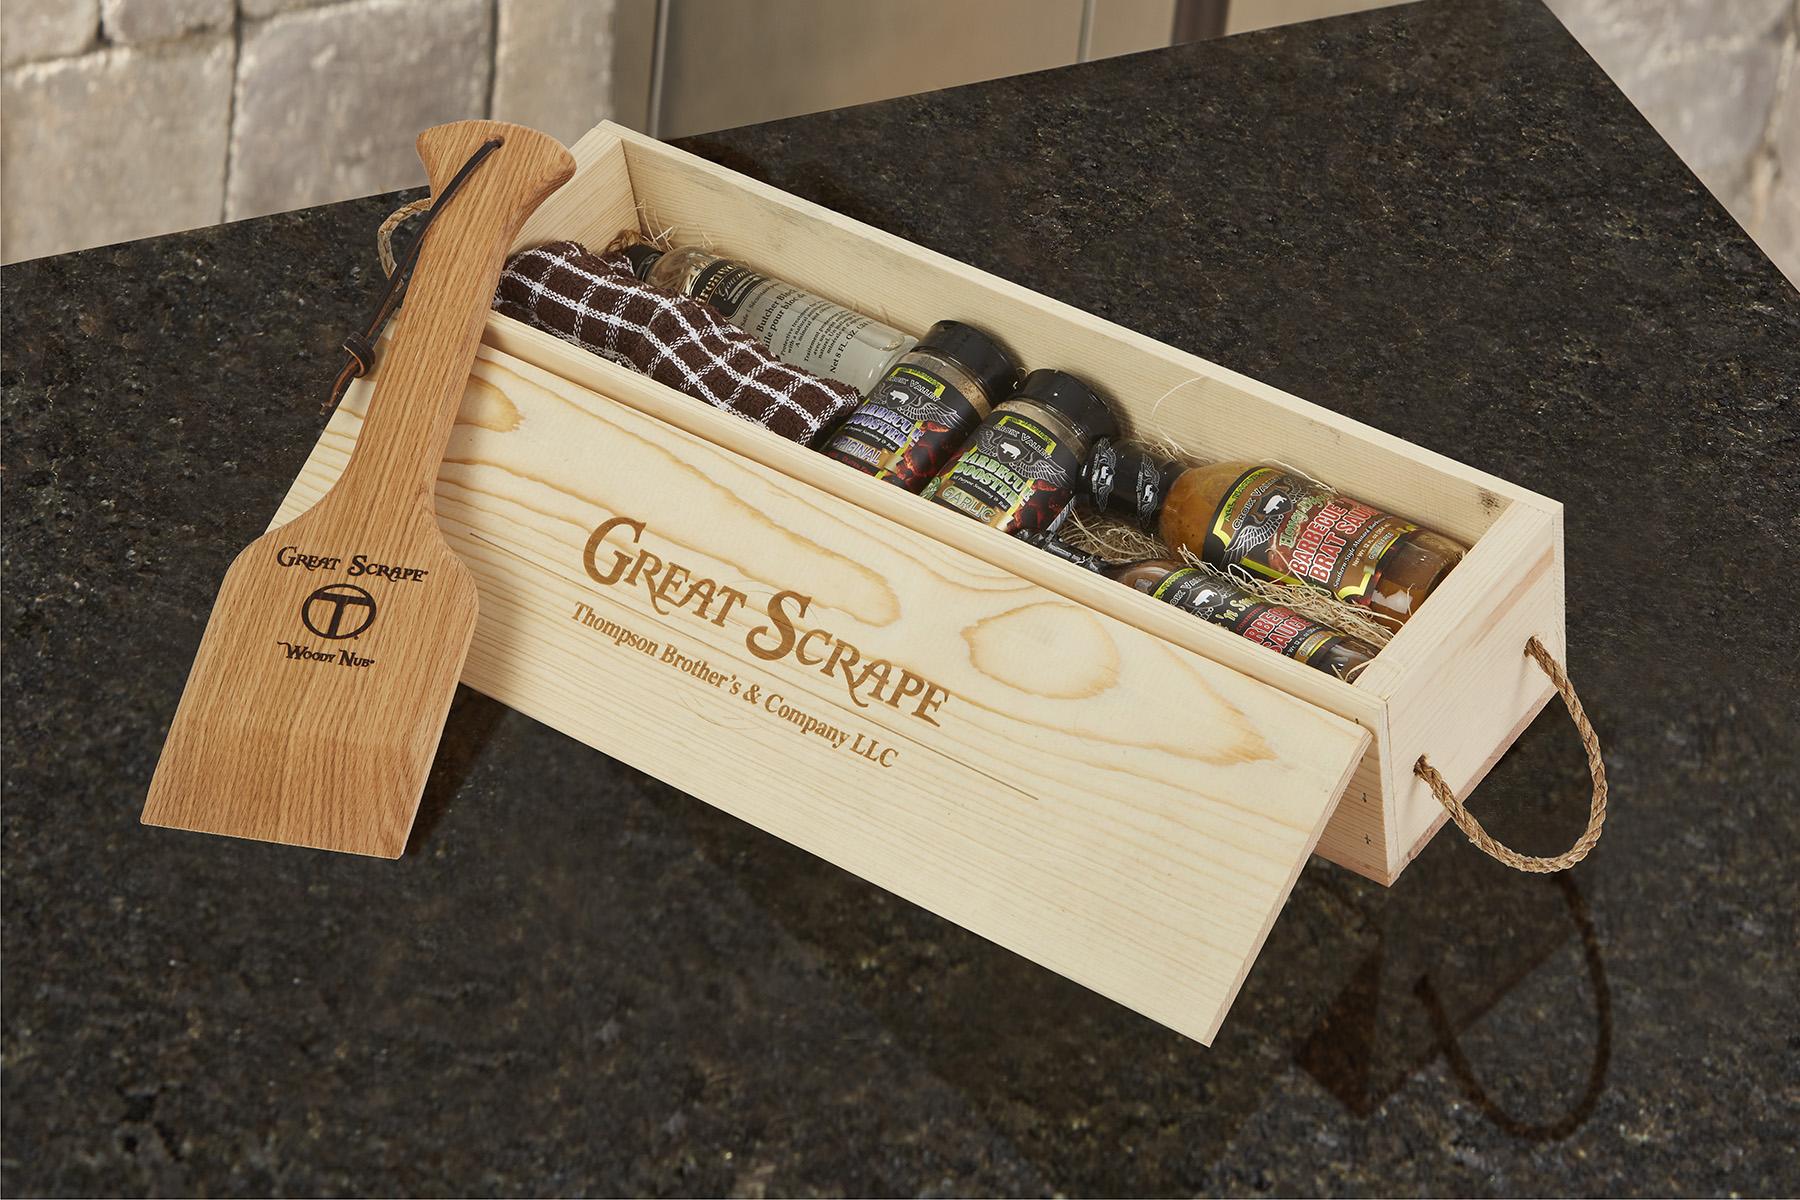 Gift Box Nub on granite -29896 RET 4x6